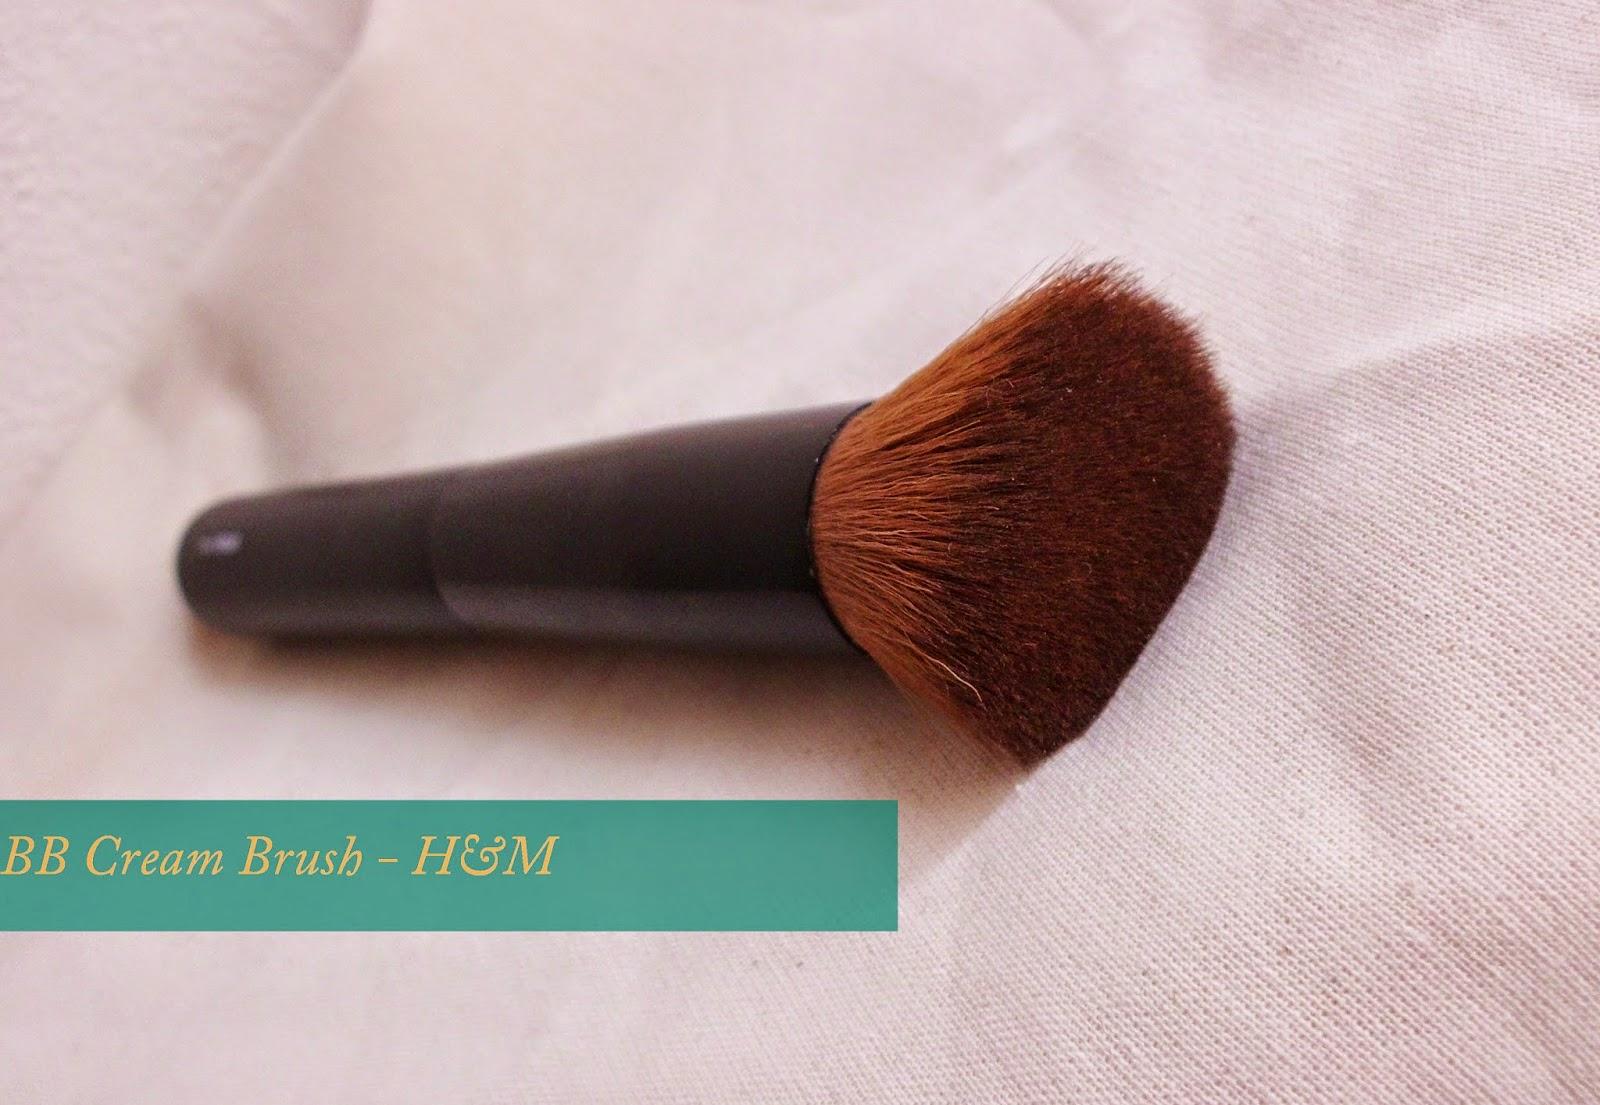 BB Cream Brush, H&M